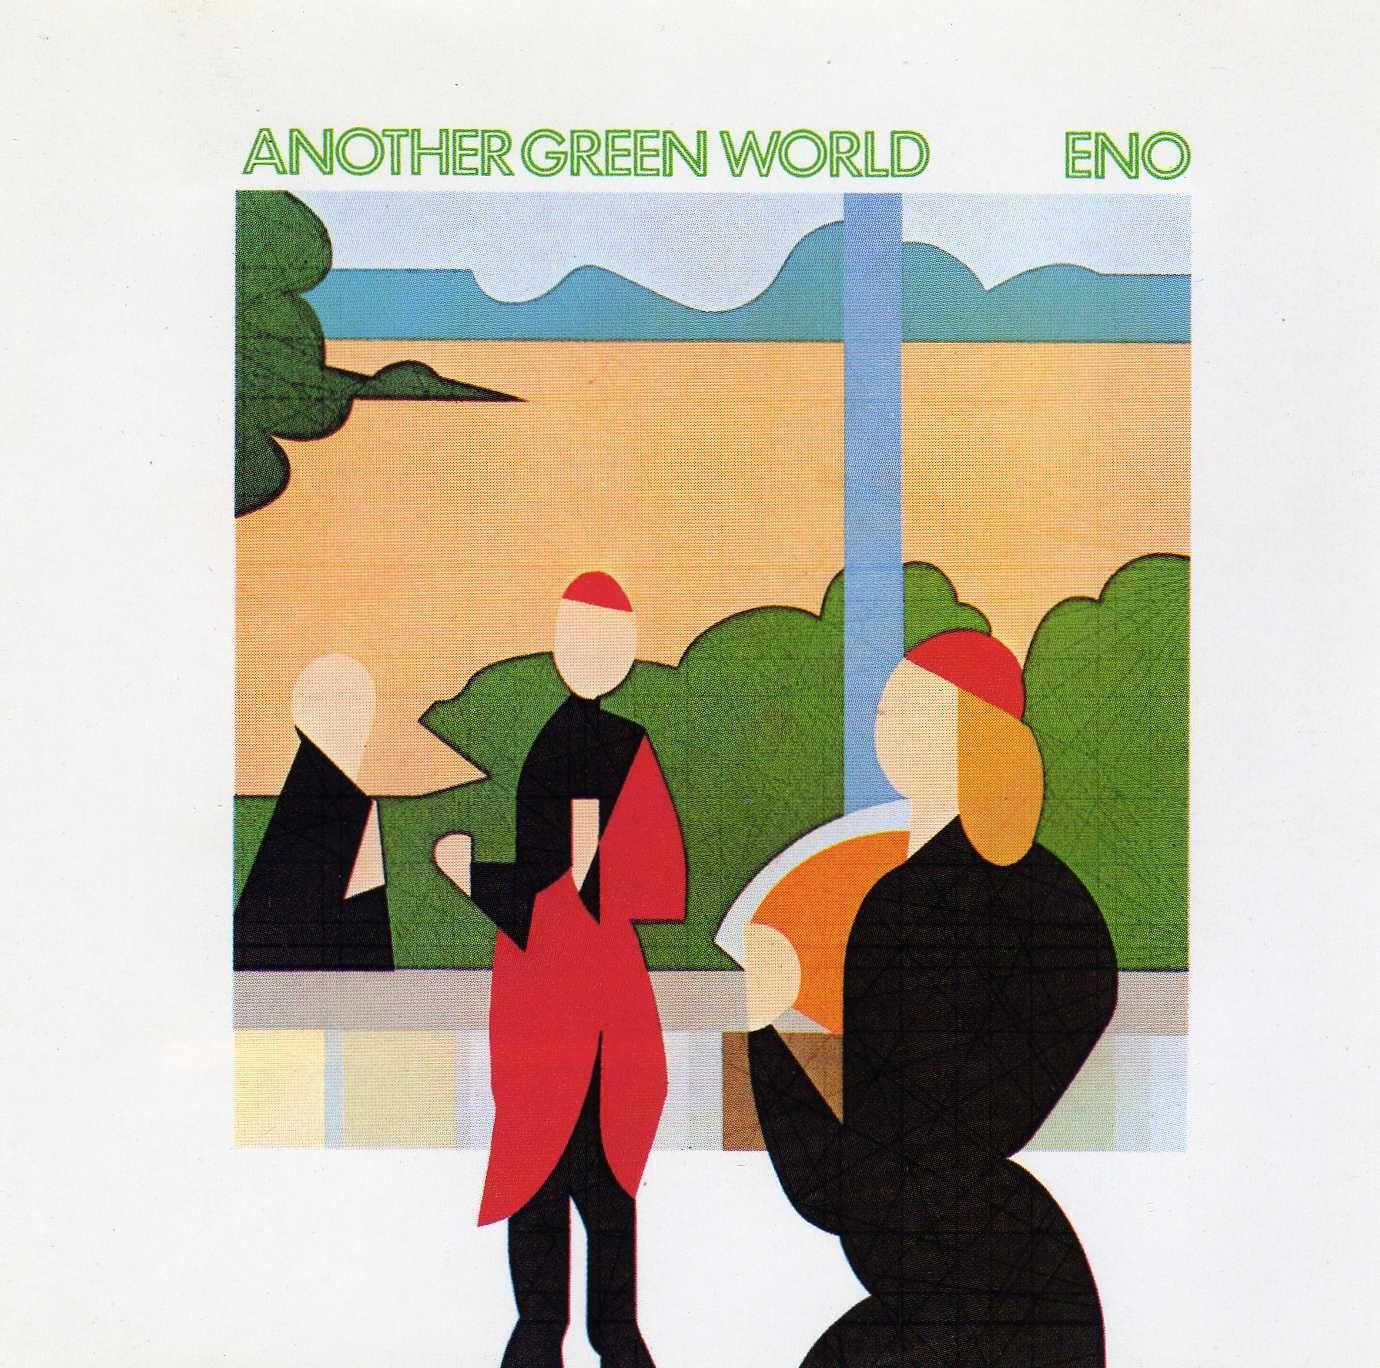 Jazz Rock Fusion Guitar Brian Eno 1975 Another Green World